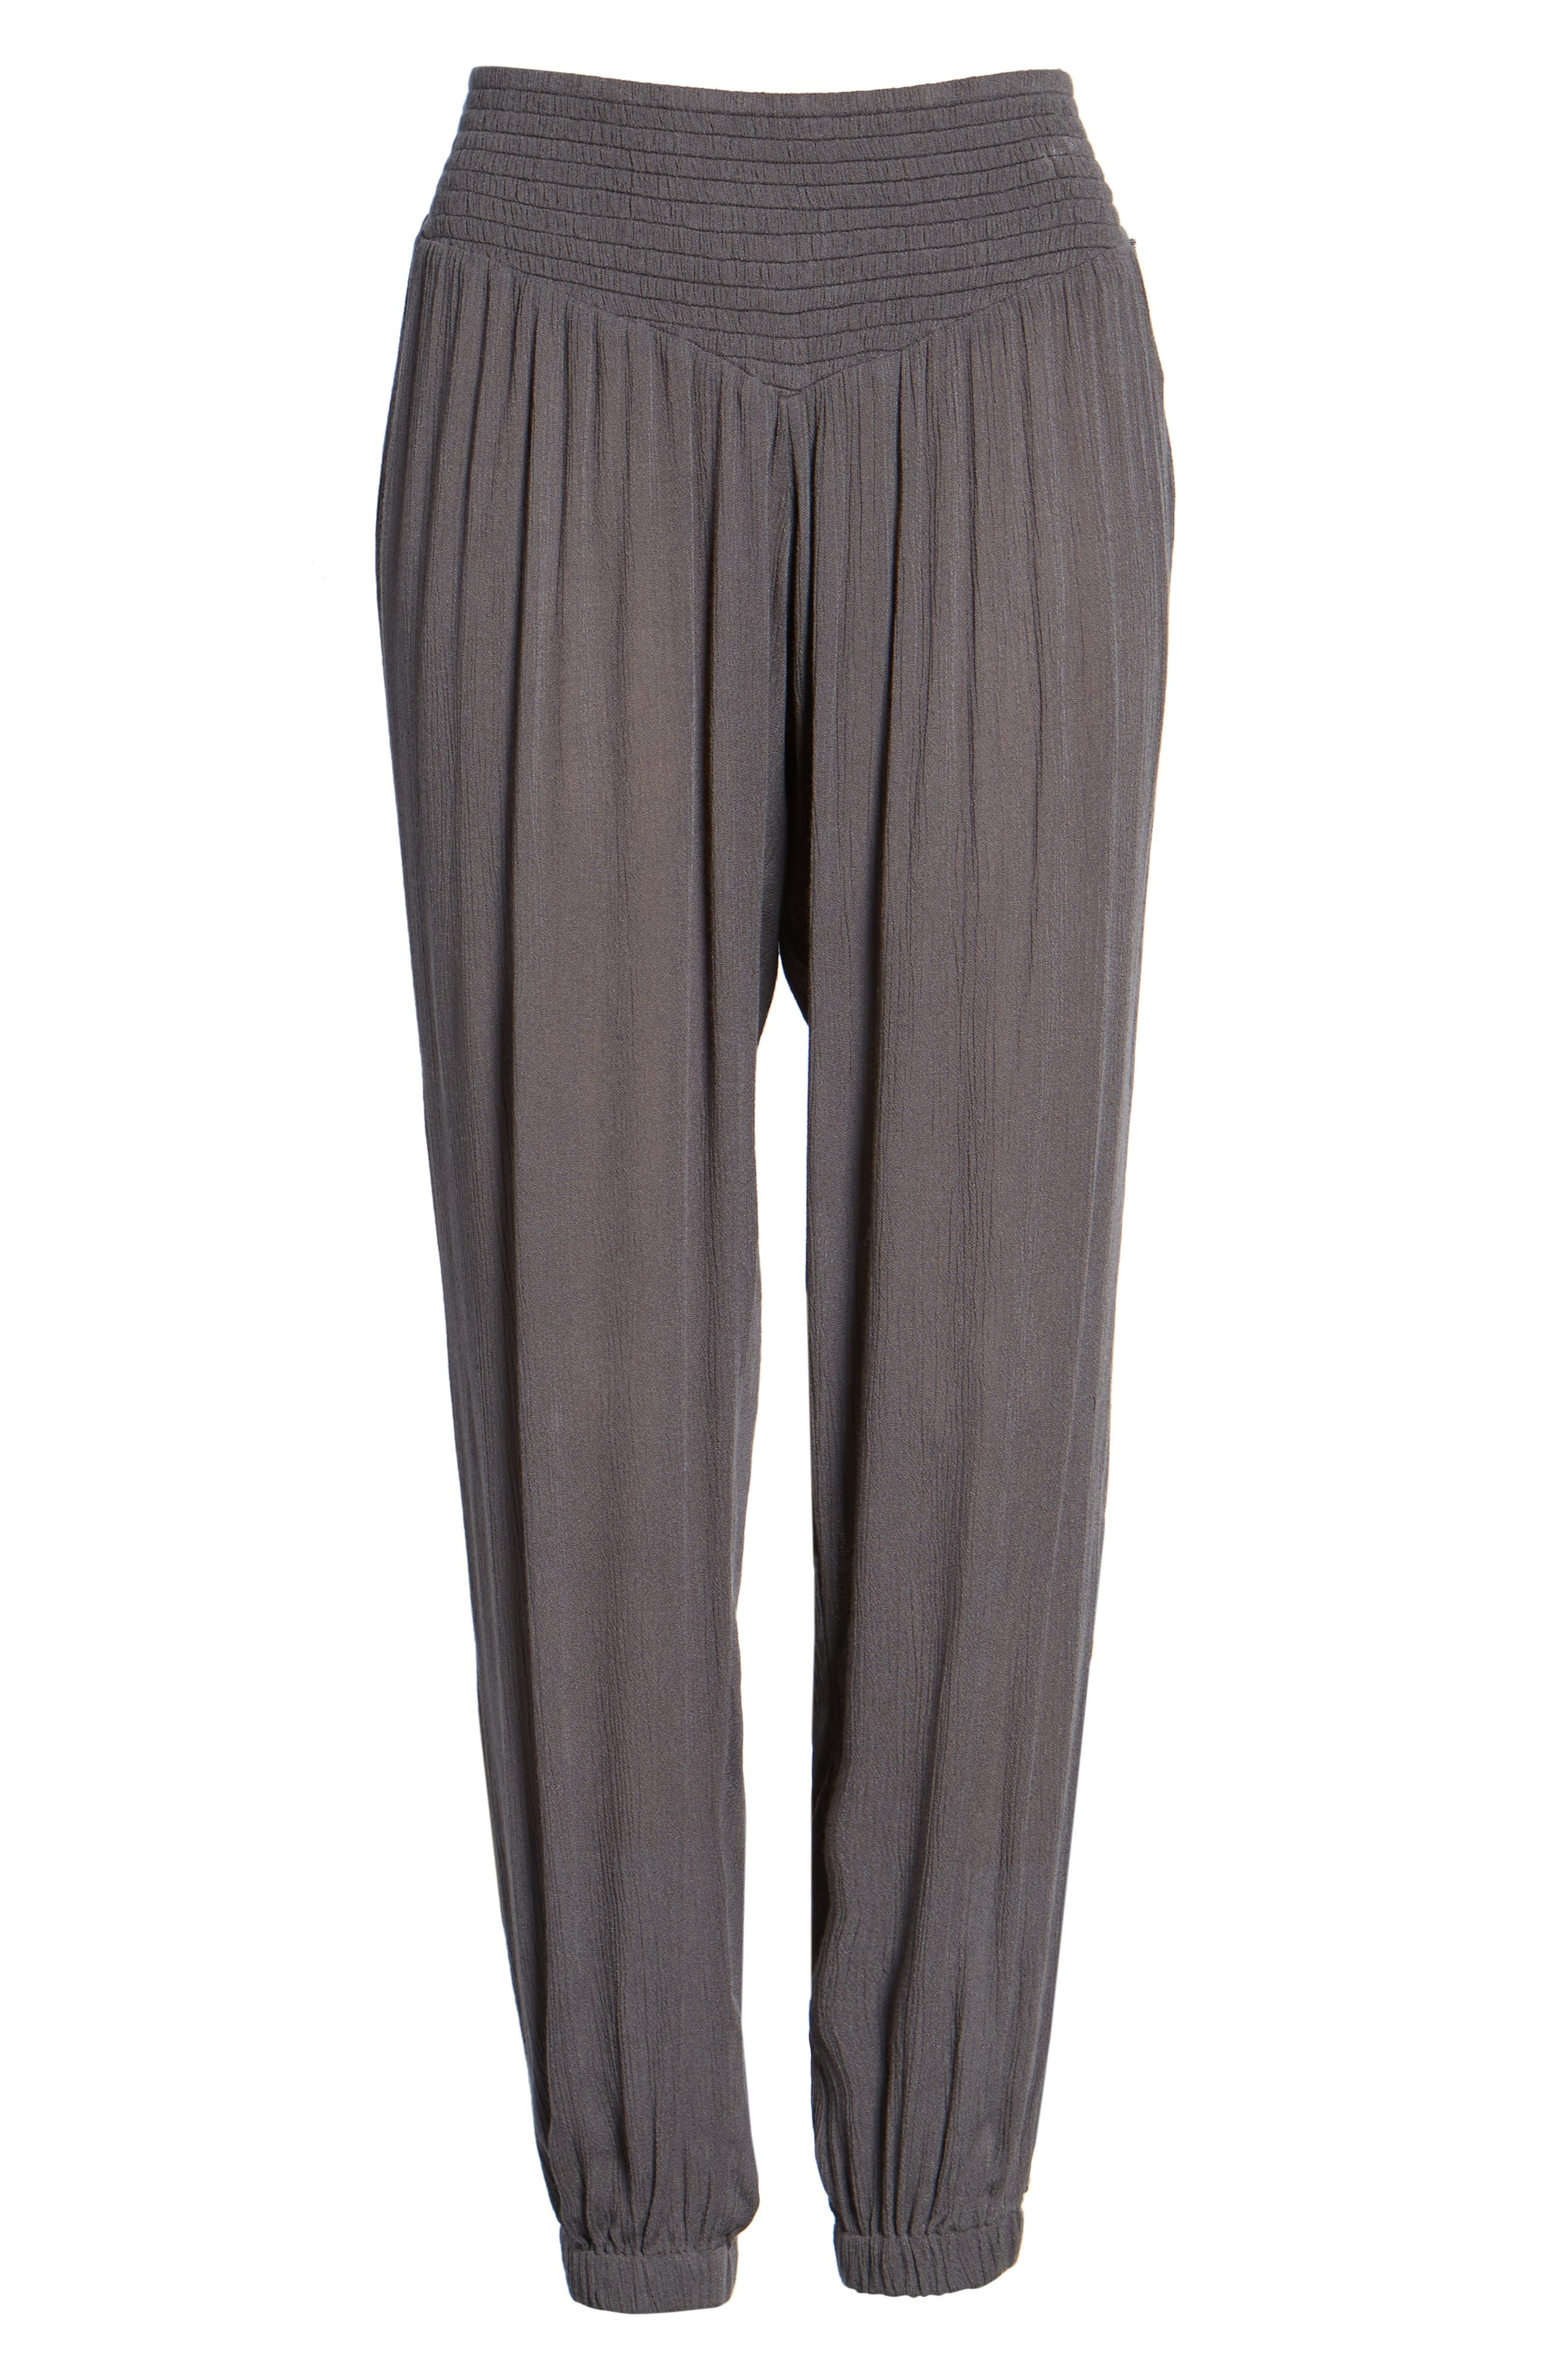 South Shore Pants,                             Alternate thumbnail 6, color,                             020